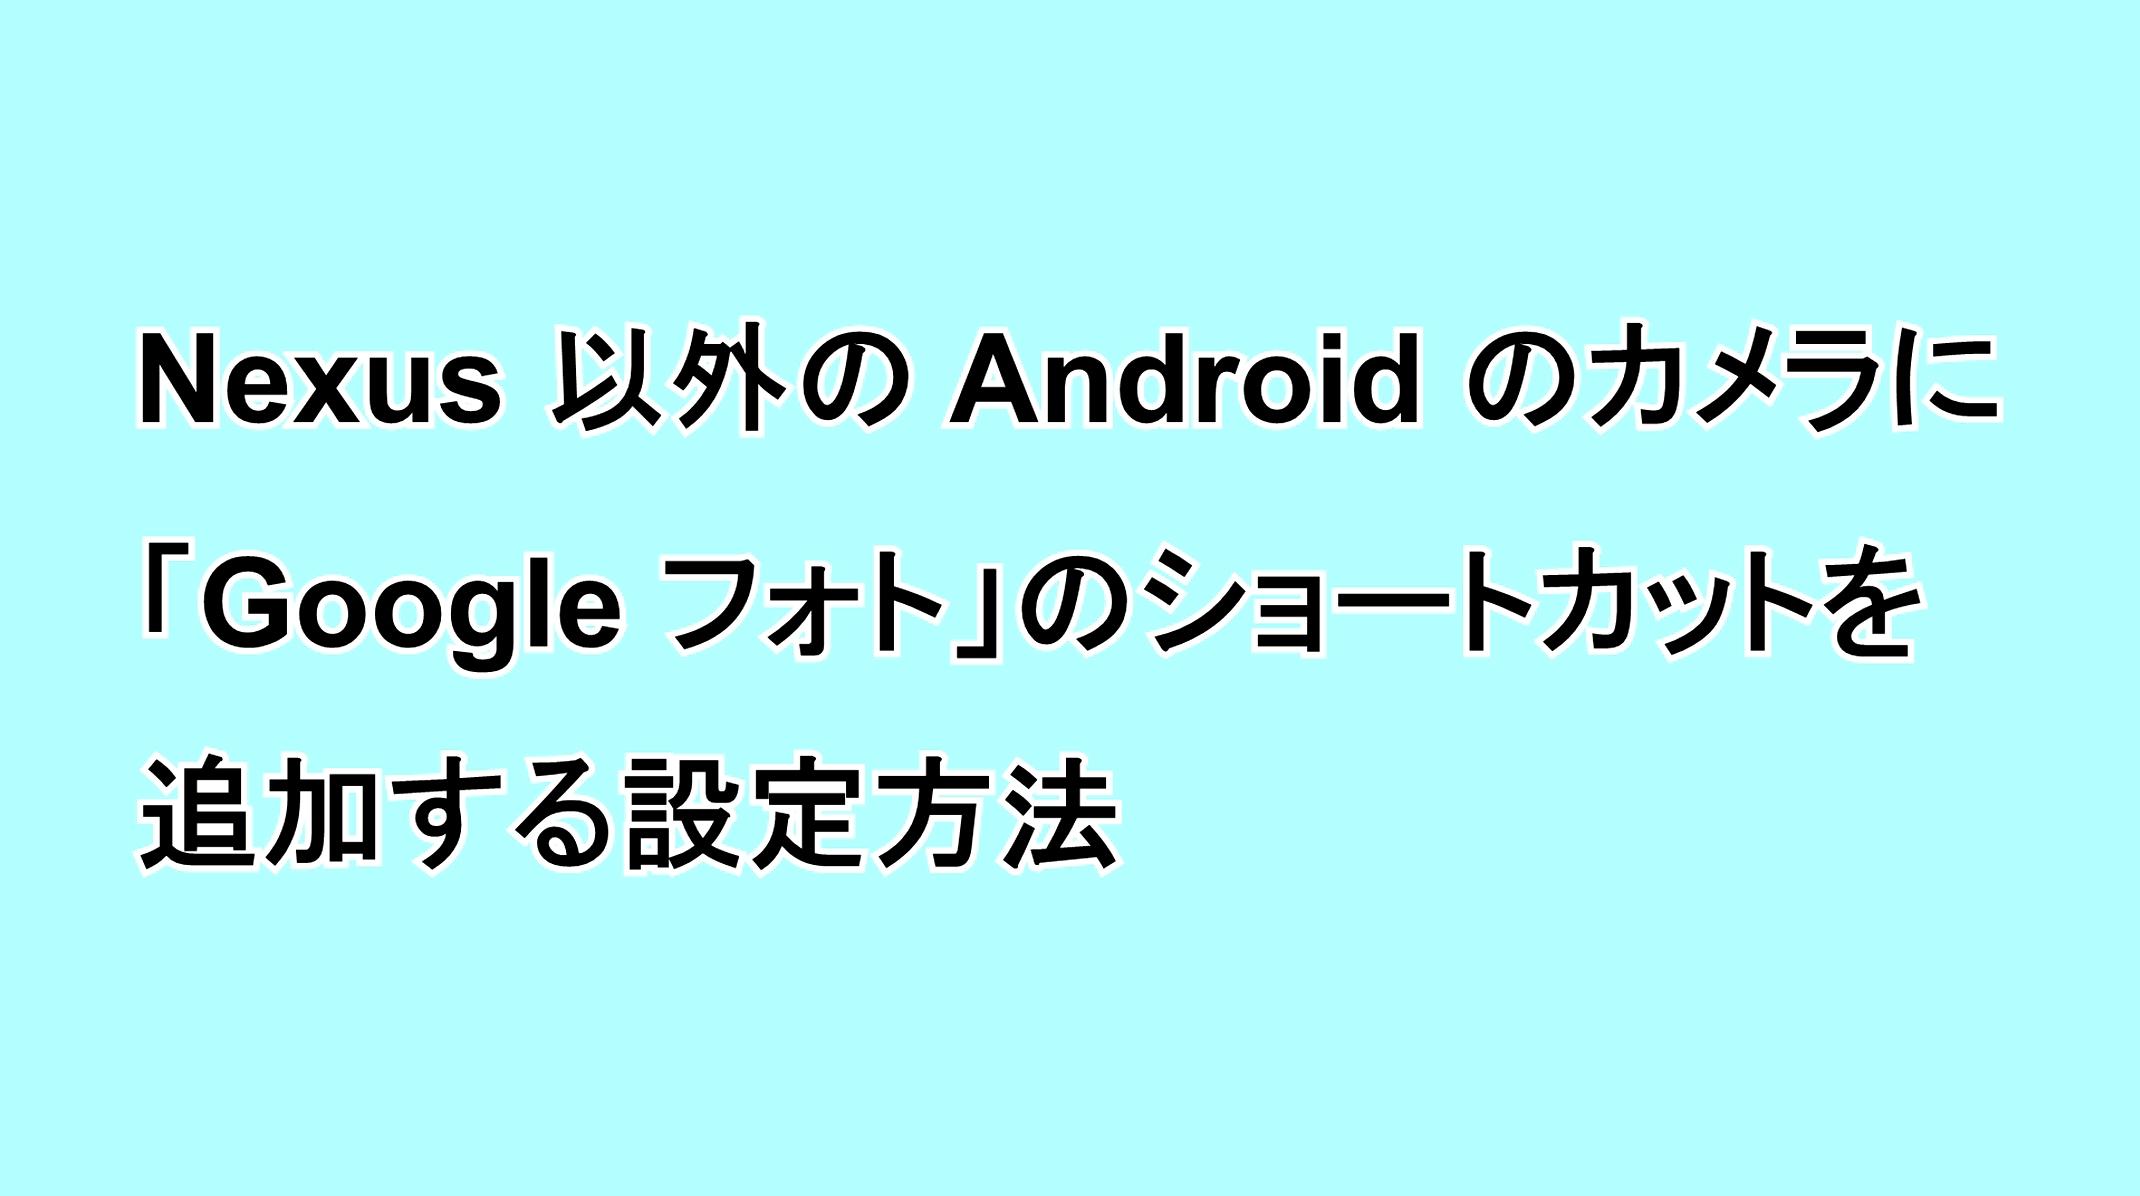 Nexus以外のAndroidでカメラ機能に「Google フォト」のショートカットを追加する設定方法